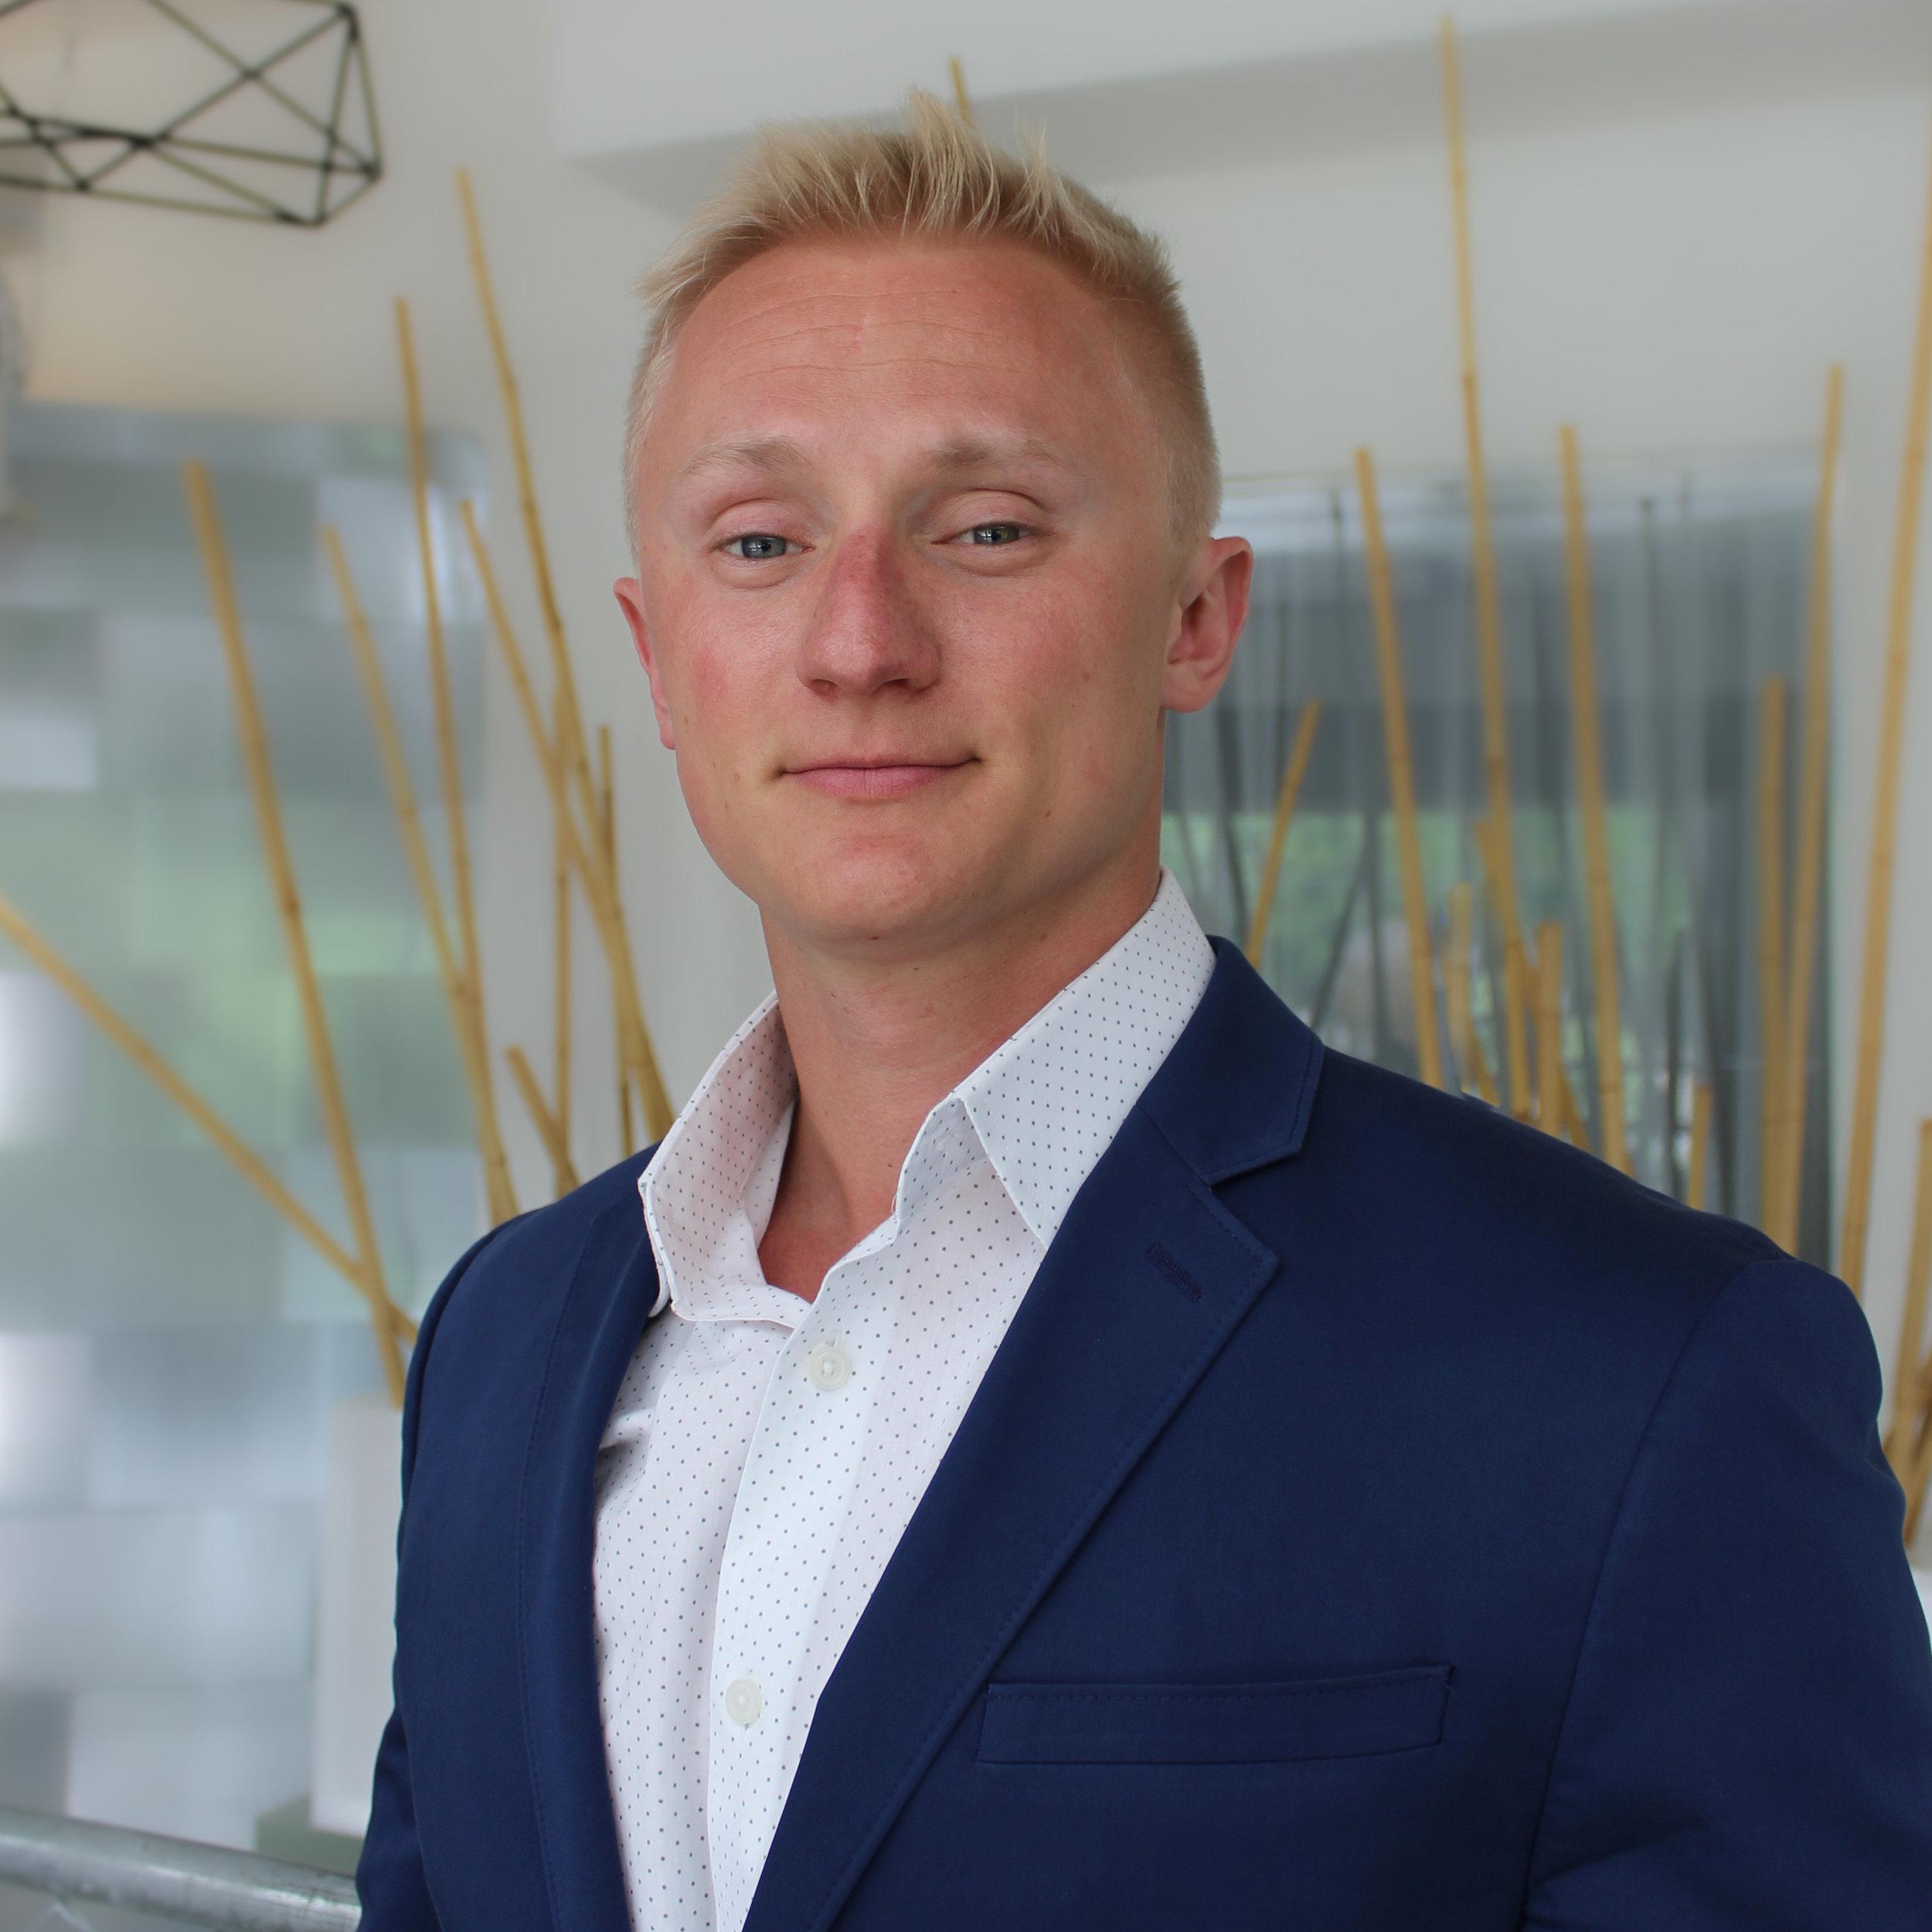 Bartosz - Director of Marketing